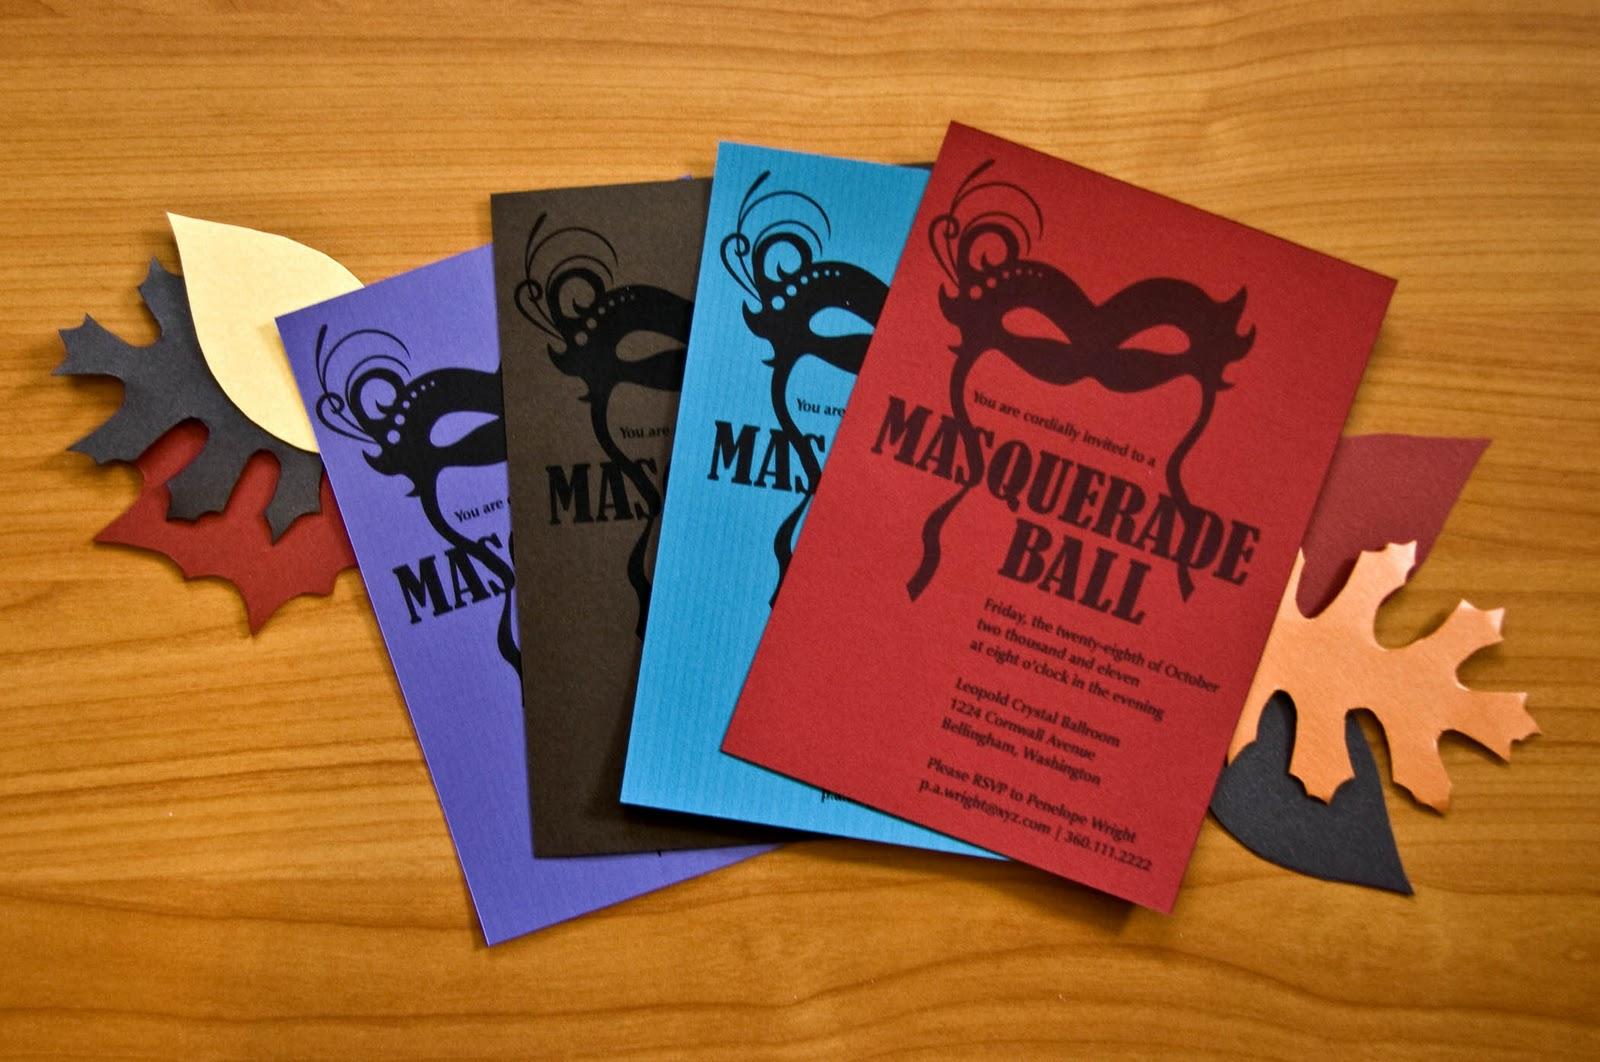 Enchanting Masquerade Ball Wedding Invitations Image - Invitation ...